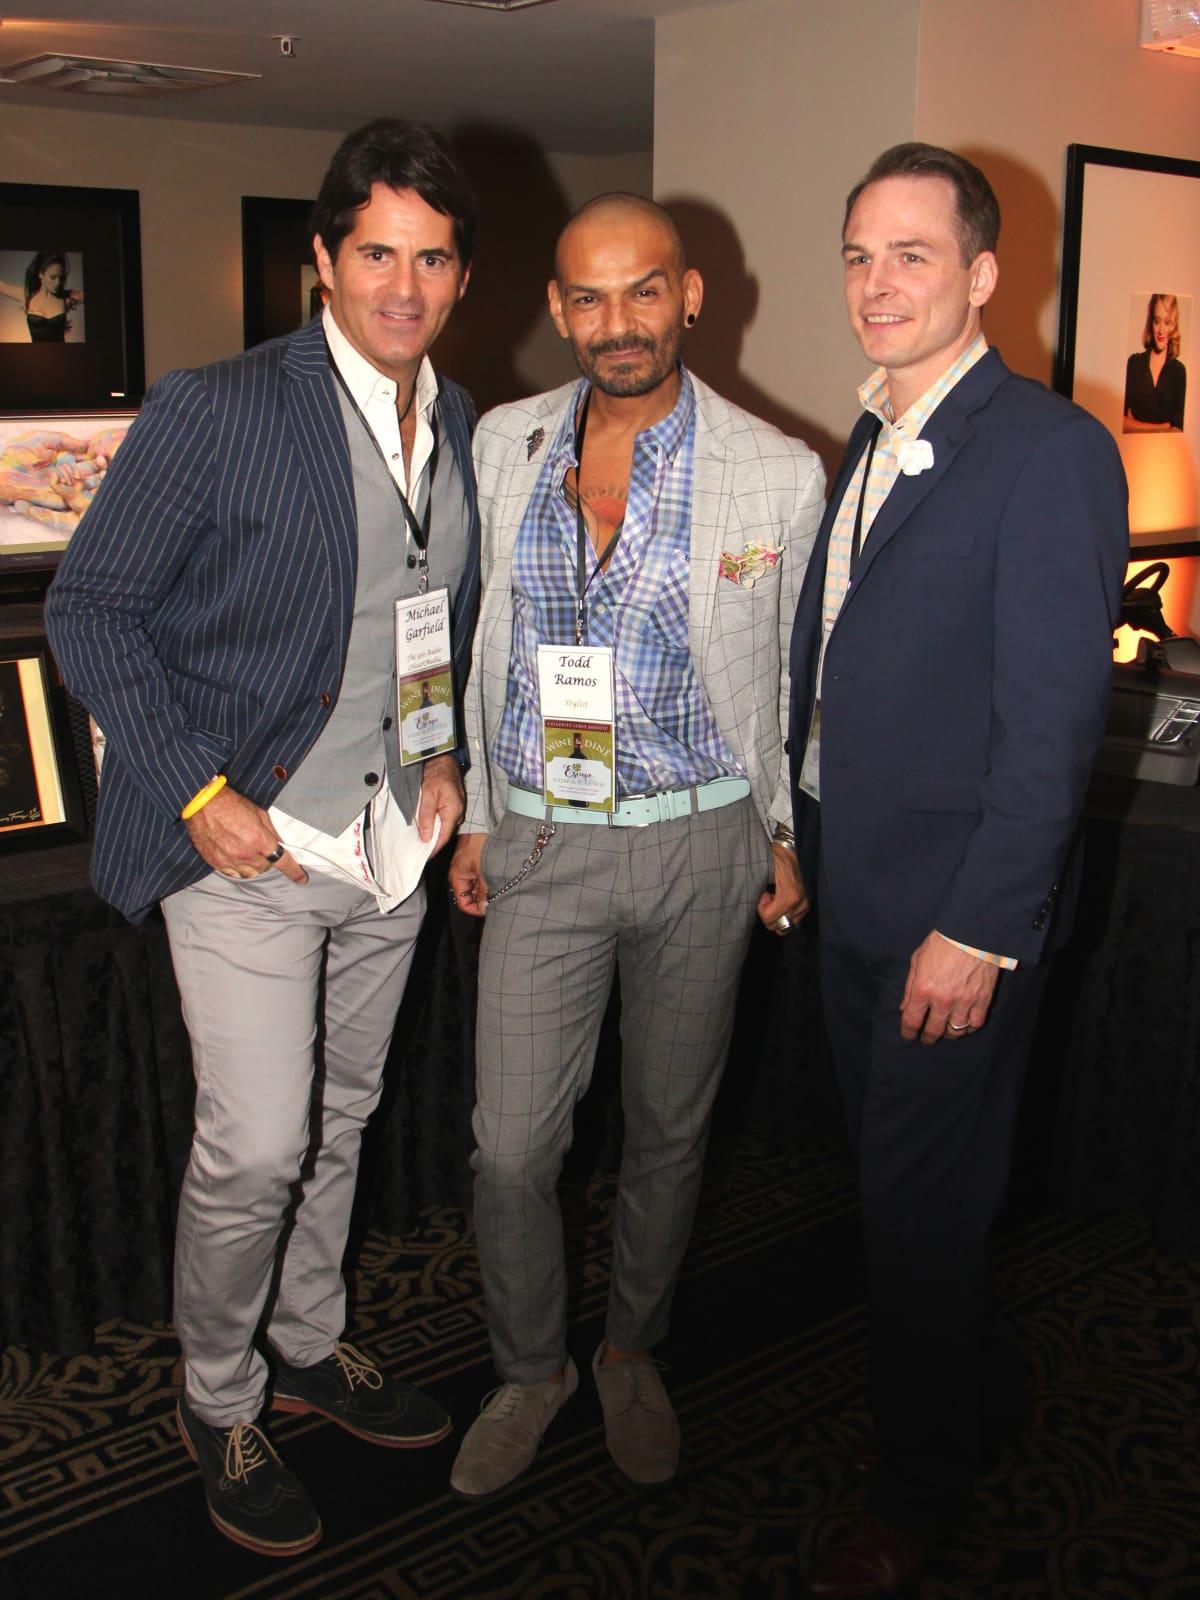 Escape Celebrity Waiters Michael Garfield, Todd Ramos Johnny Bravo